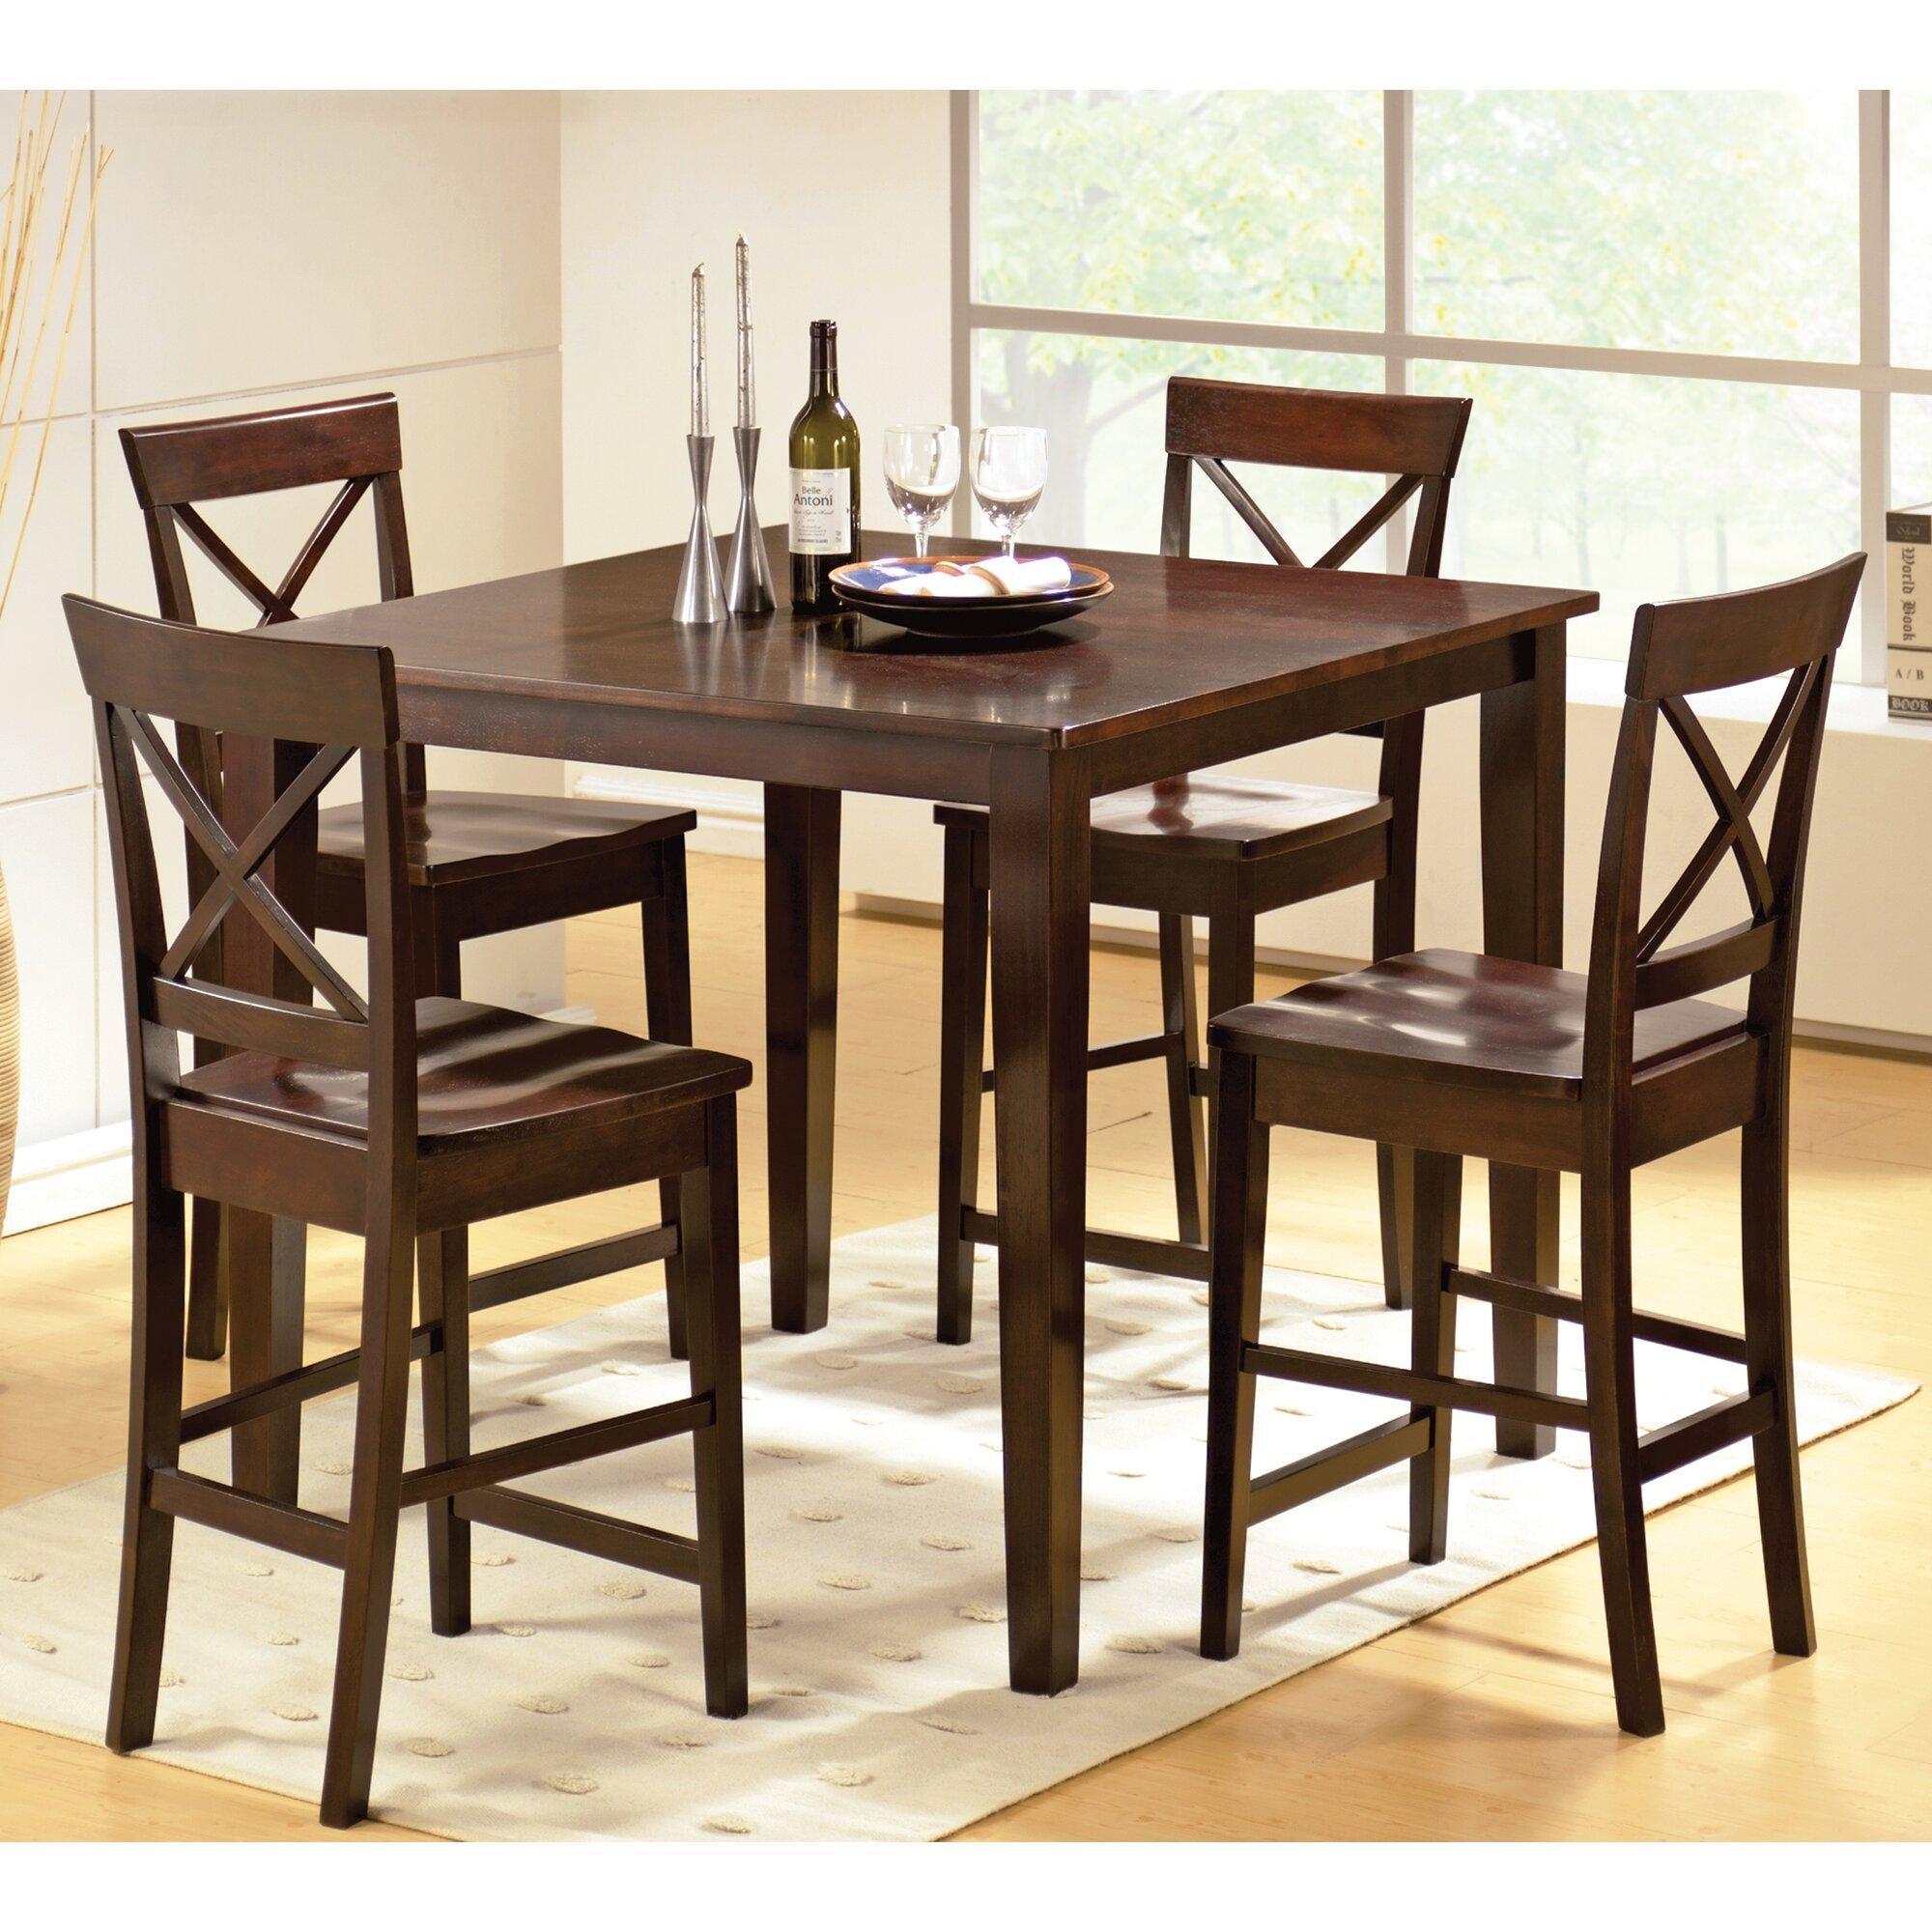 Steve Silver Furniture Cobalt 5 Piece Counter Height Dining Set ...